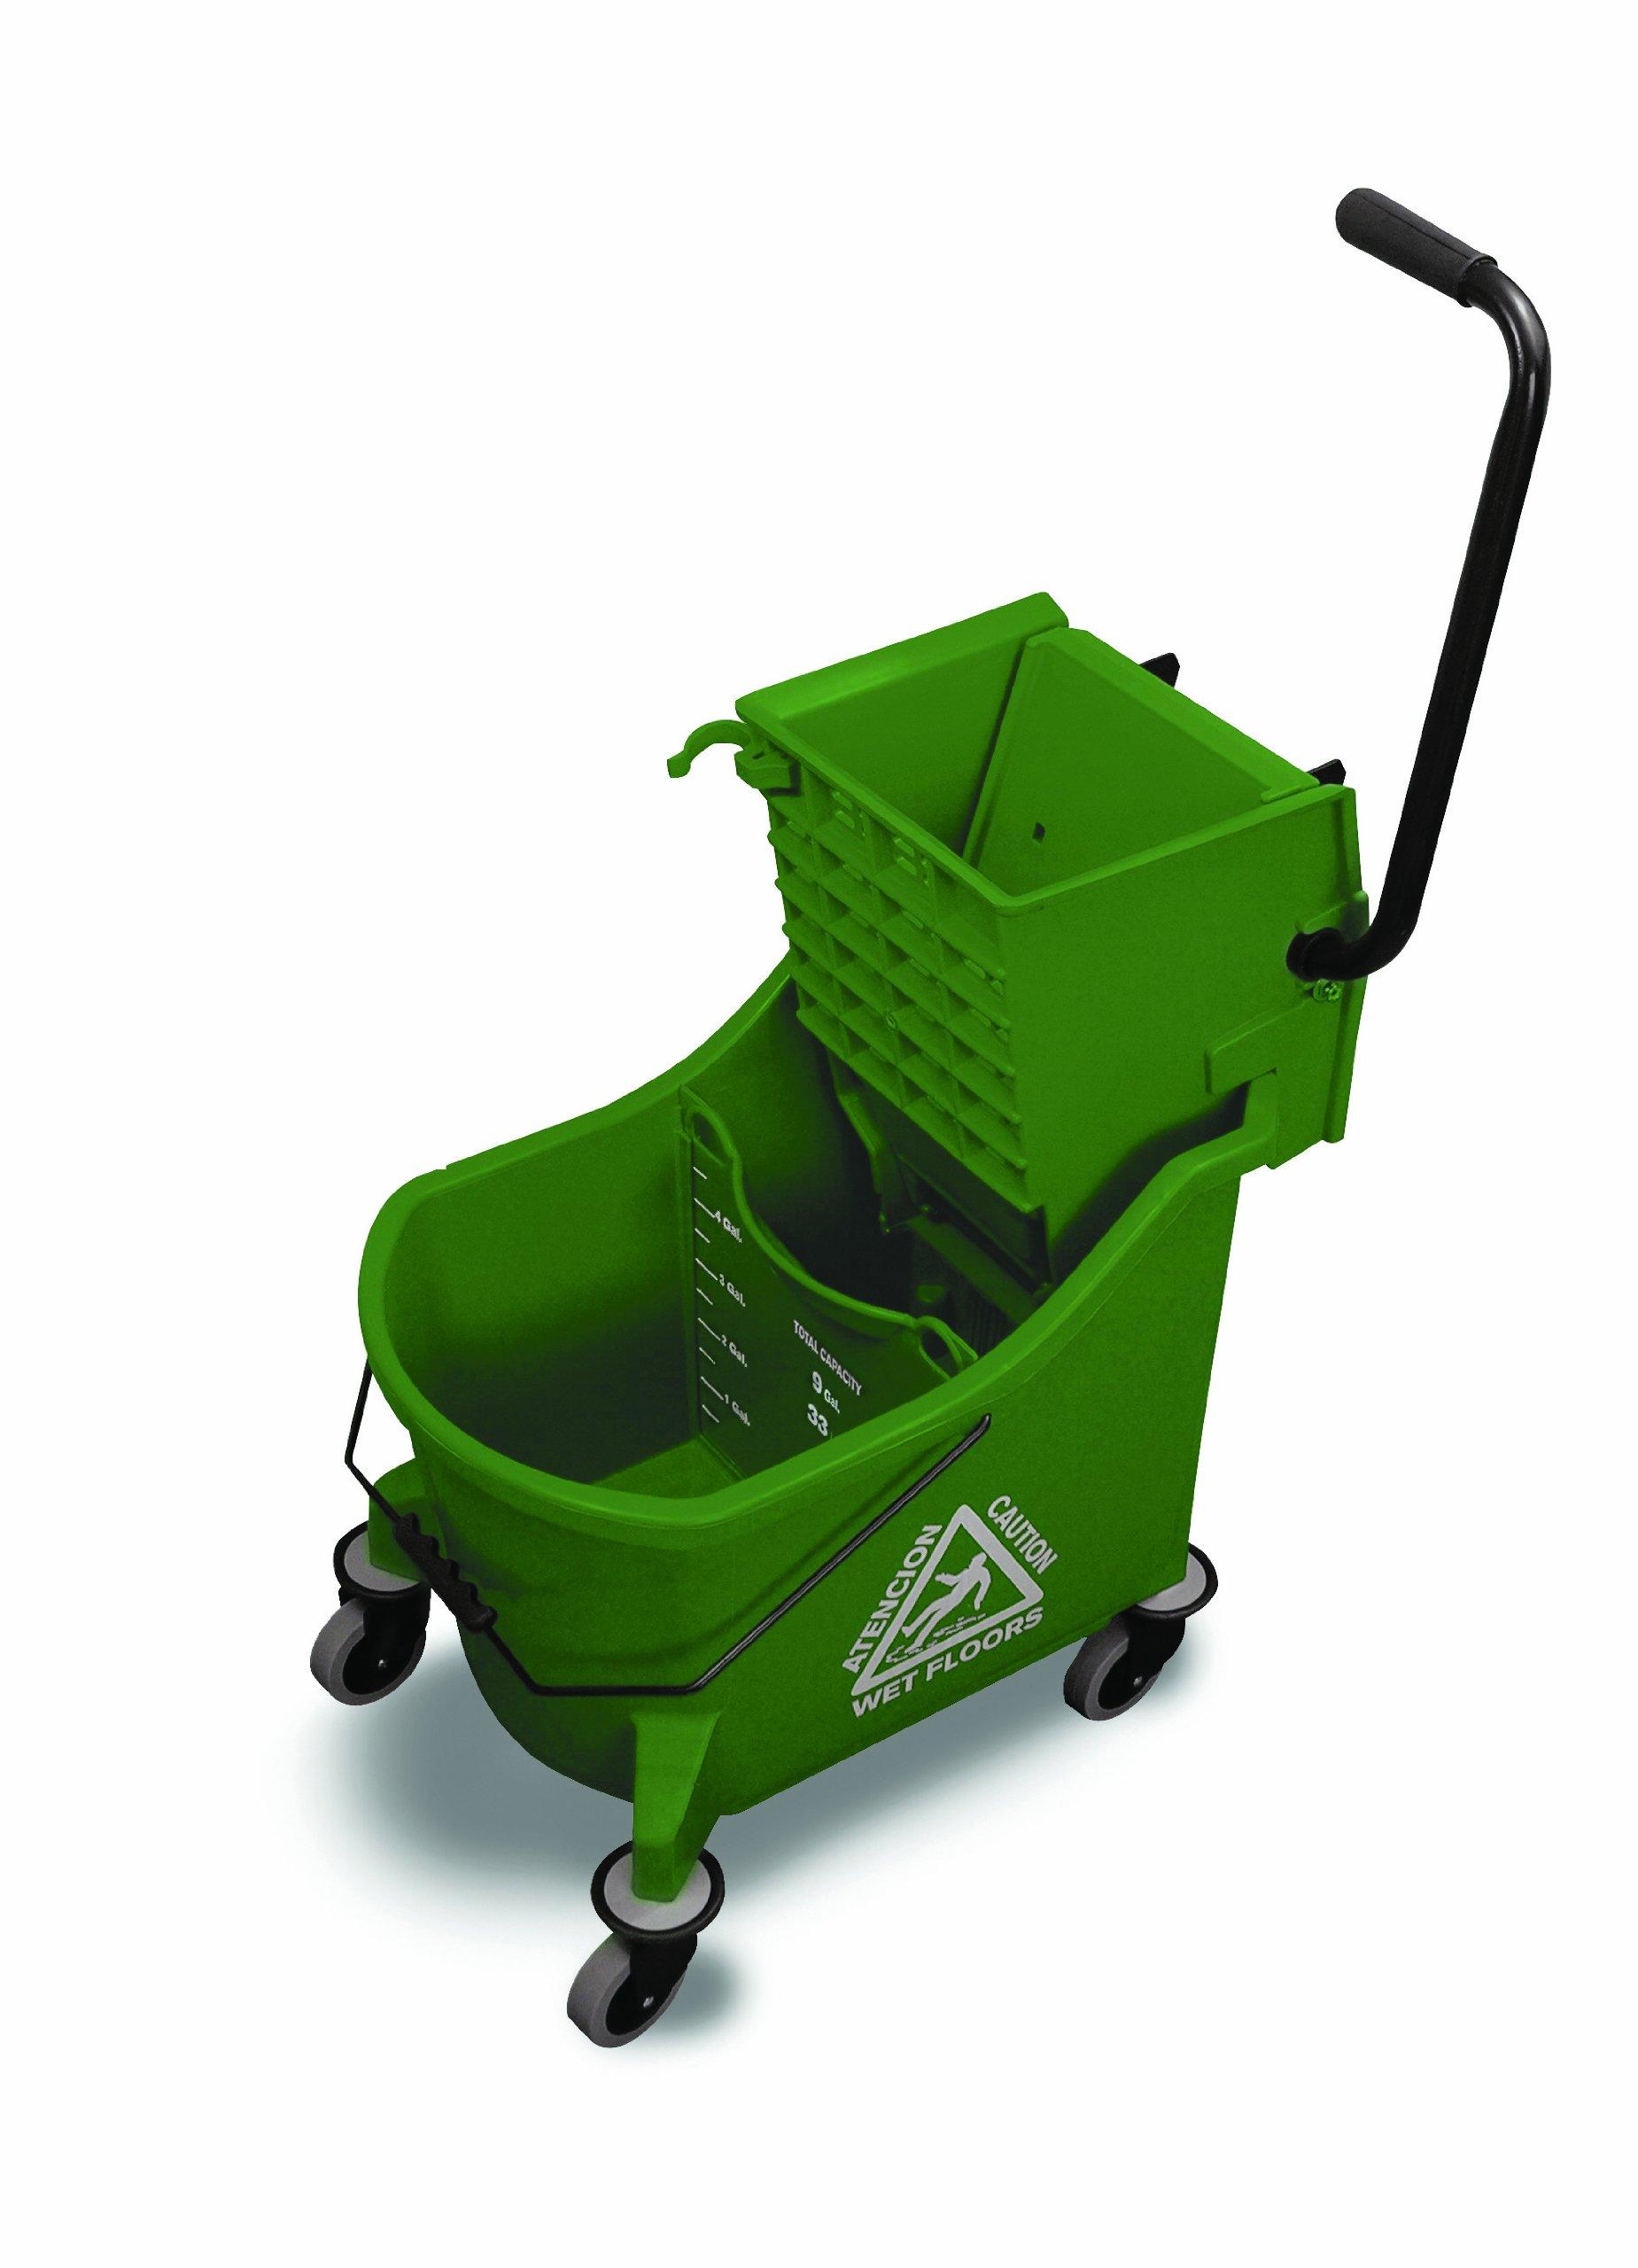 O'Cedar Commercial 6980 MaxiPlus Mop Bucket and Wringer, Green